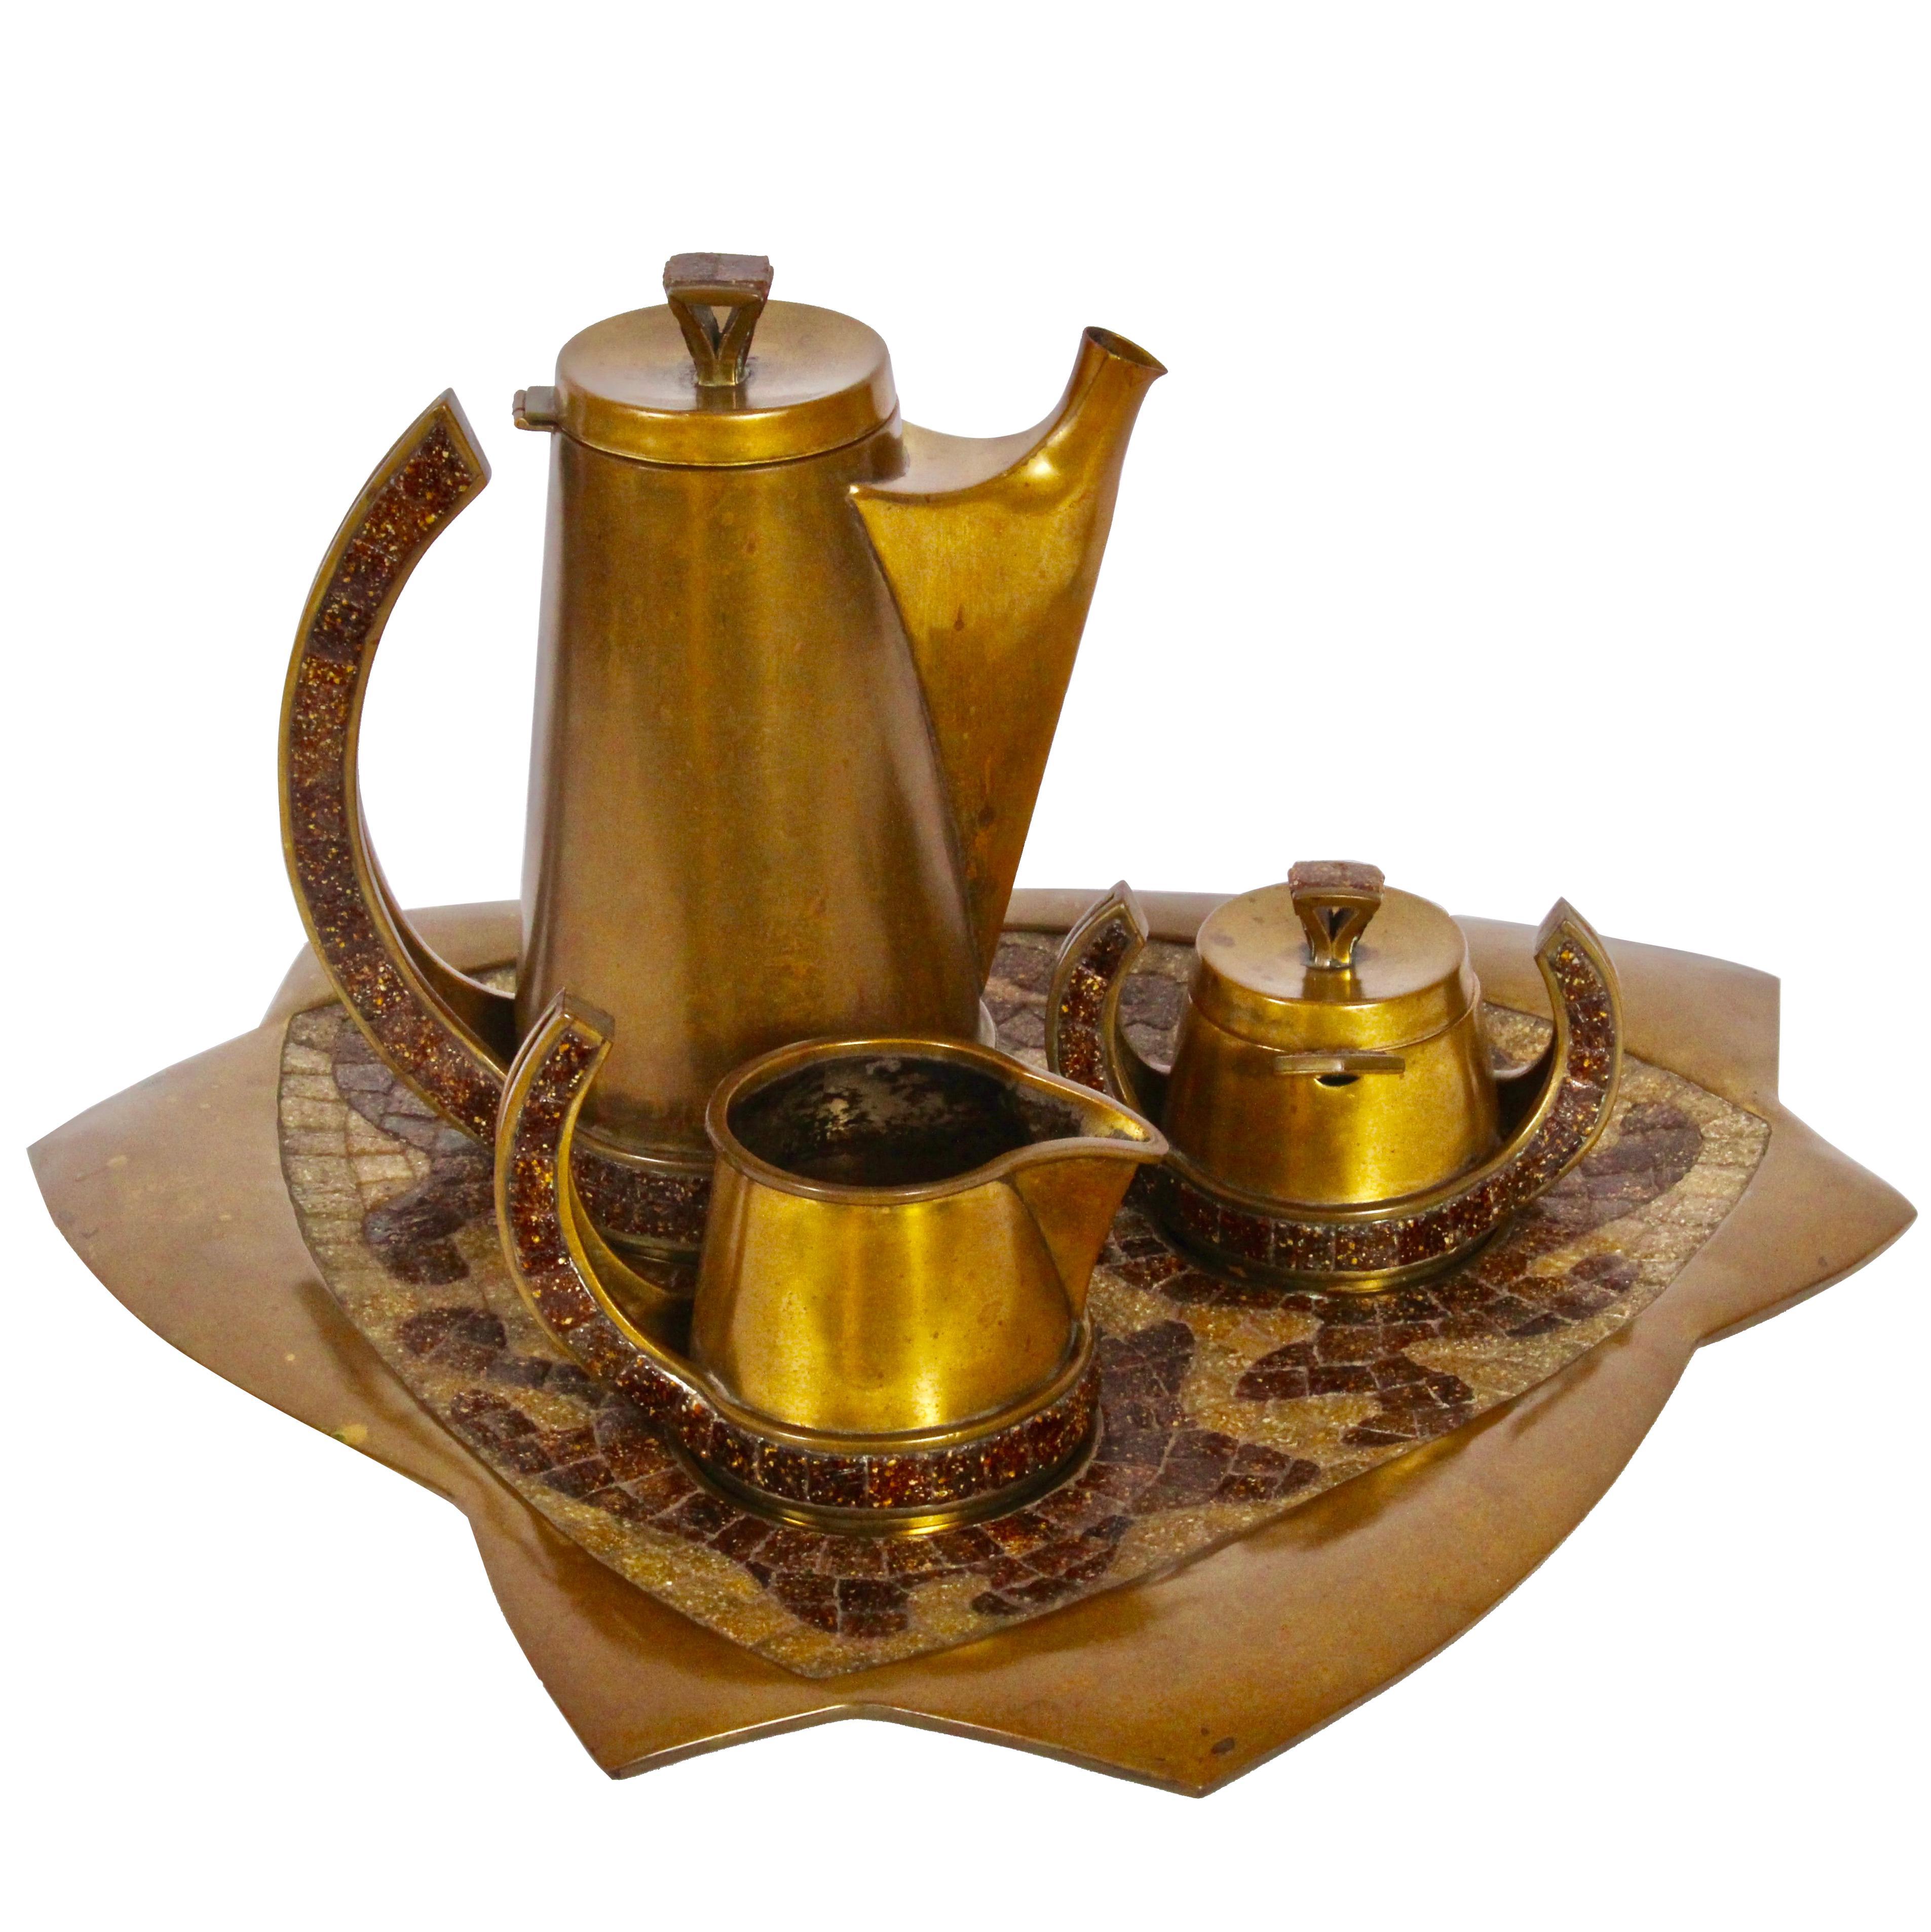 Salvador Teran Brass & Copper Terrazzo 7 Piece Tea Service, 1950s